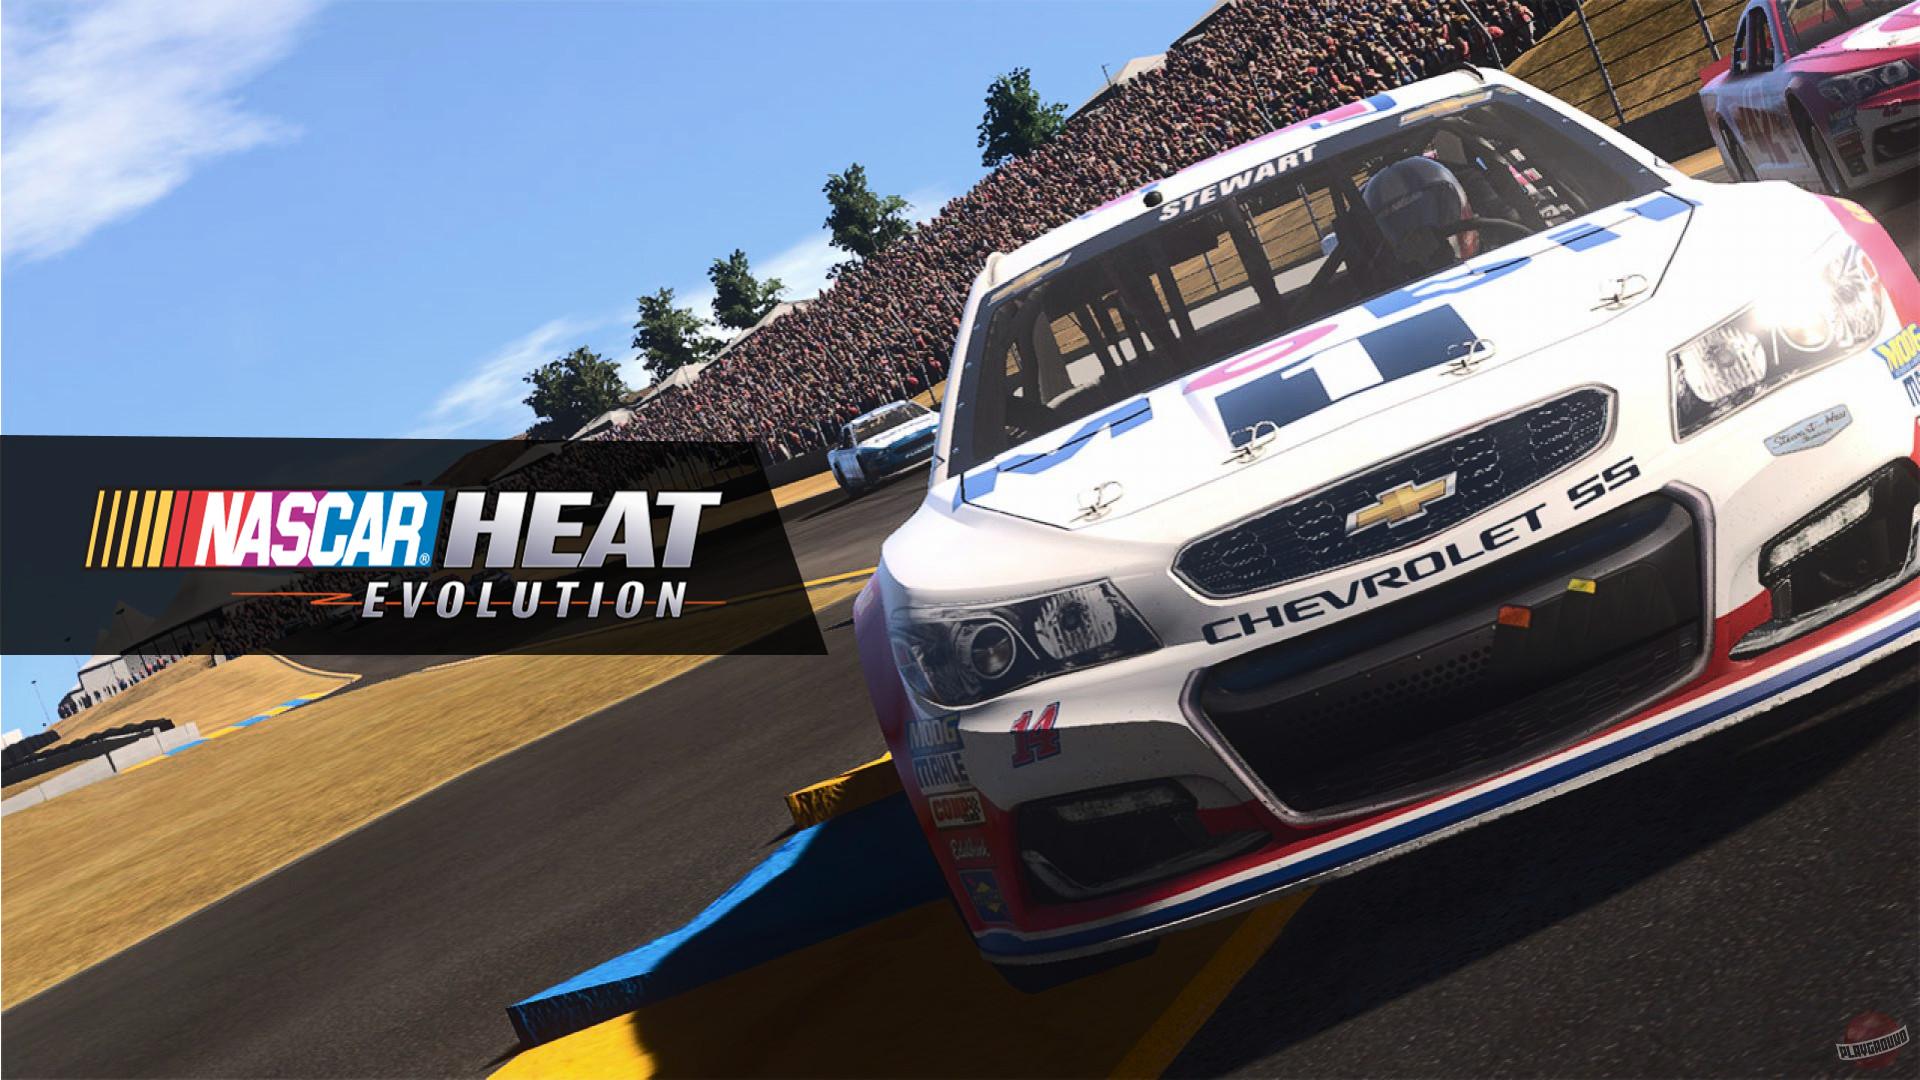 nascar heat, nascar heat evolution, racing video game, racing game, xbox racing game, ps4 racing game, mobile racing game